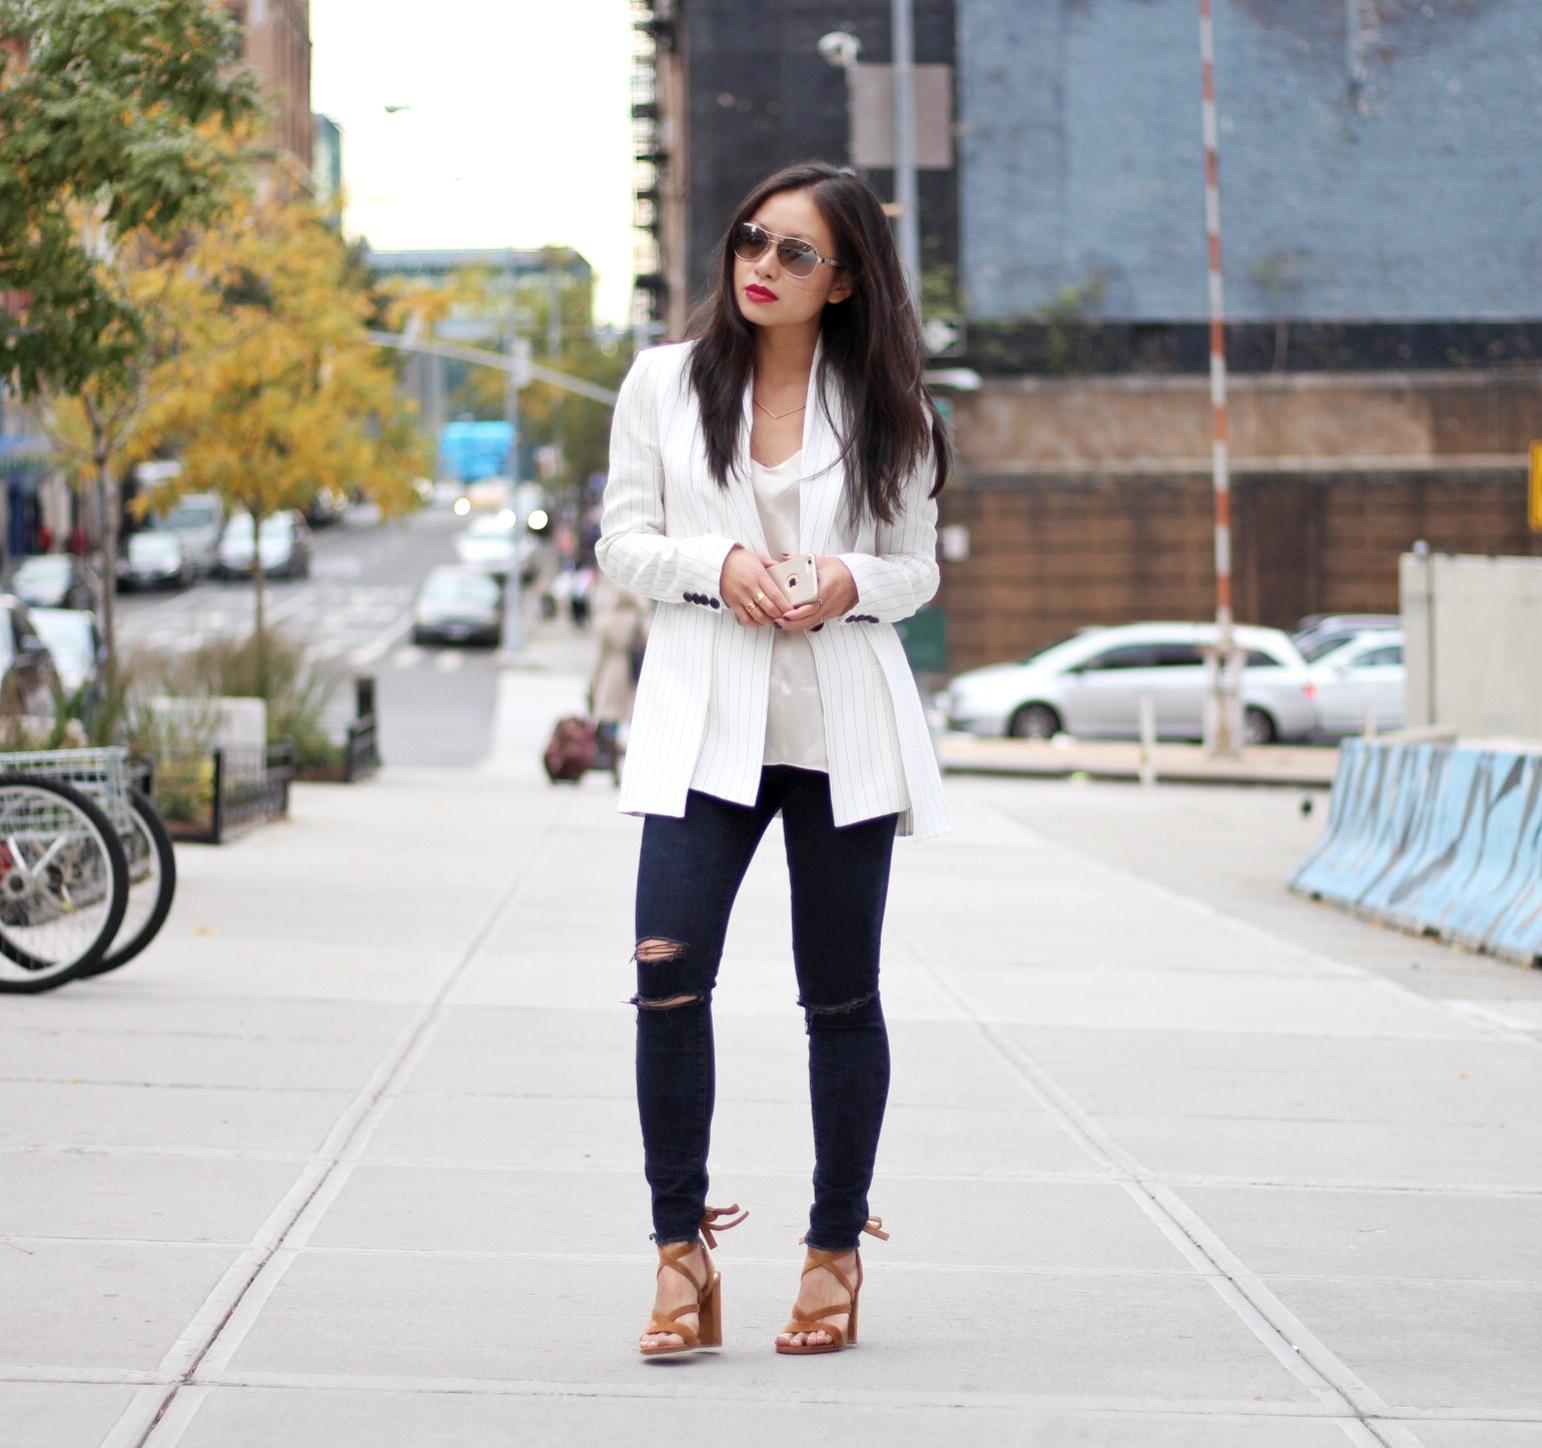 Pinstriped Thakoon blazer Rag & Bone cami J Brand blue mercy jeans Gianvito Rossi suede sandals